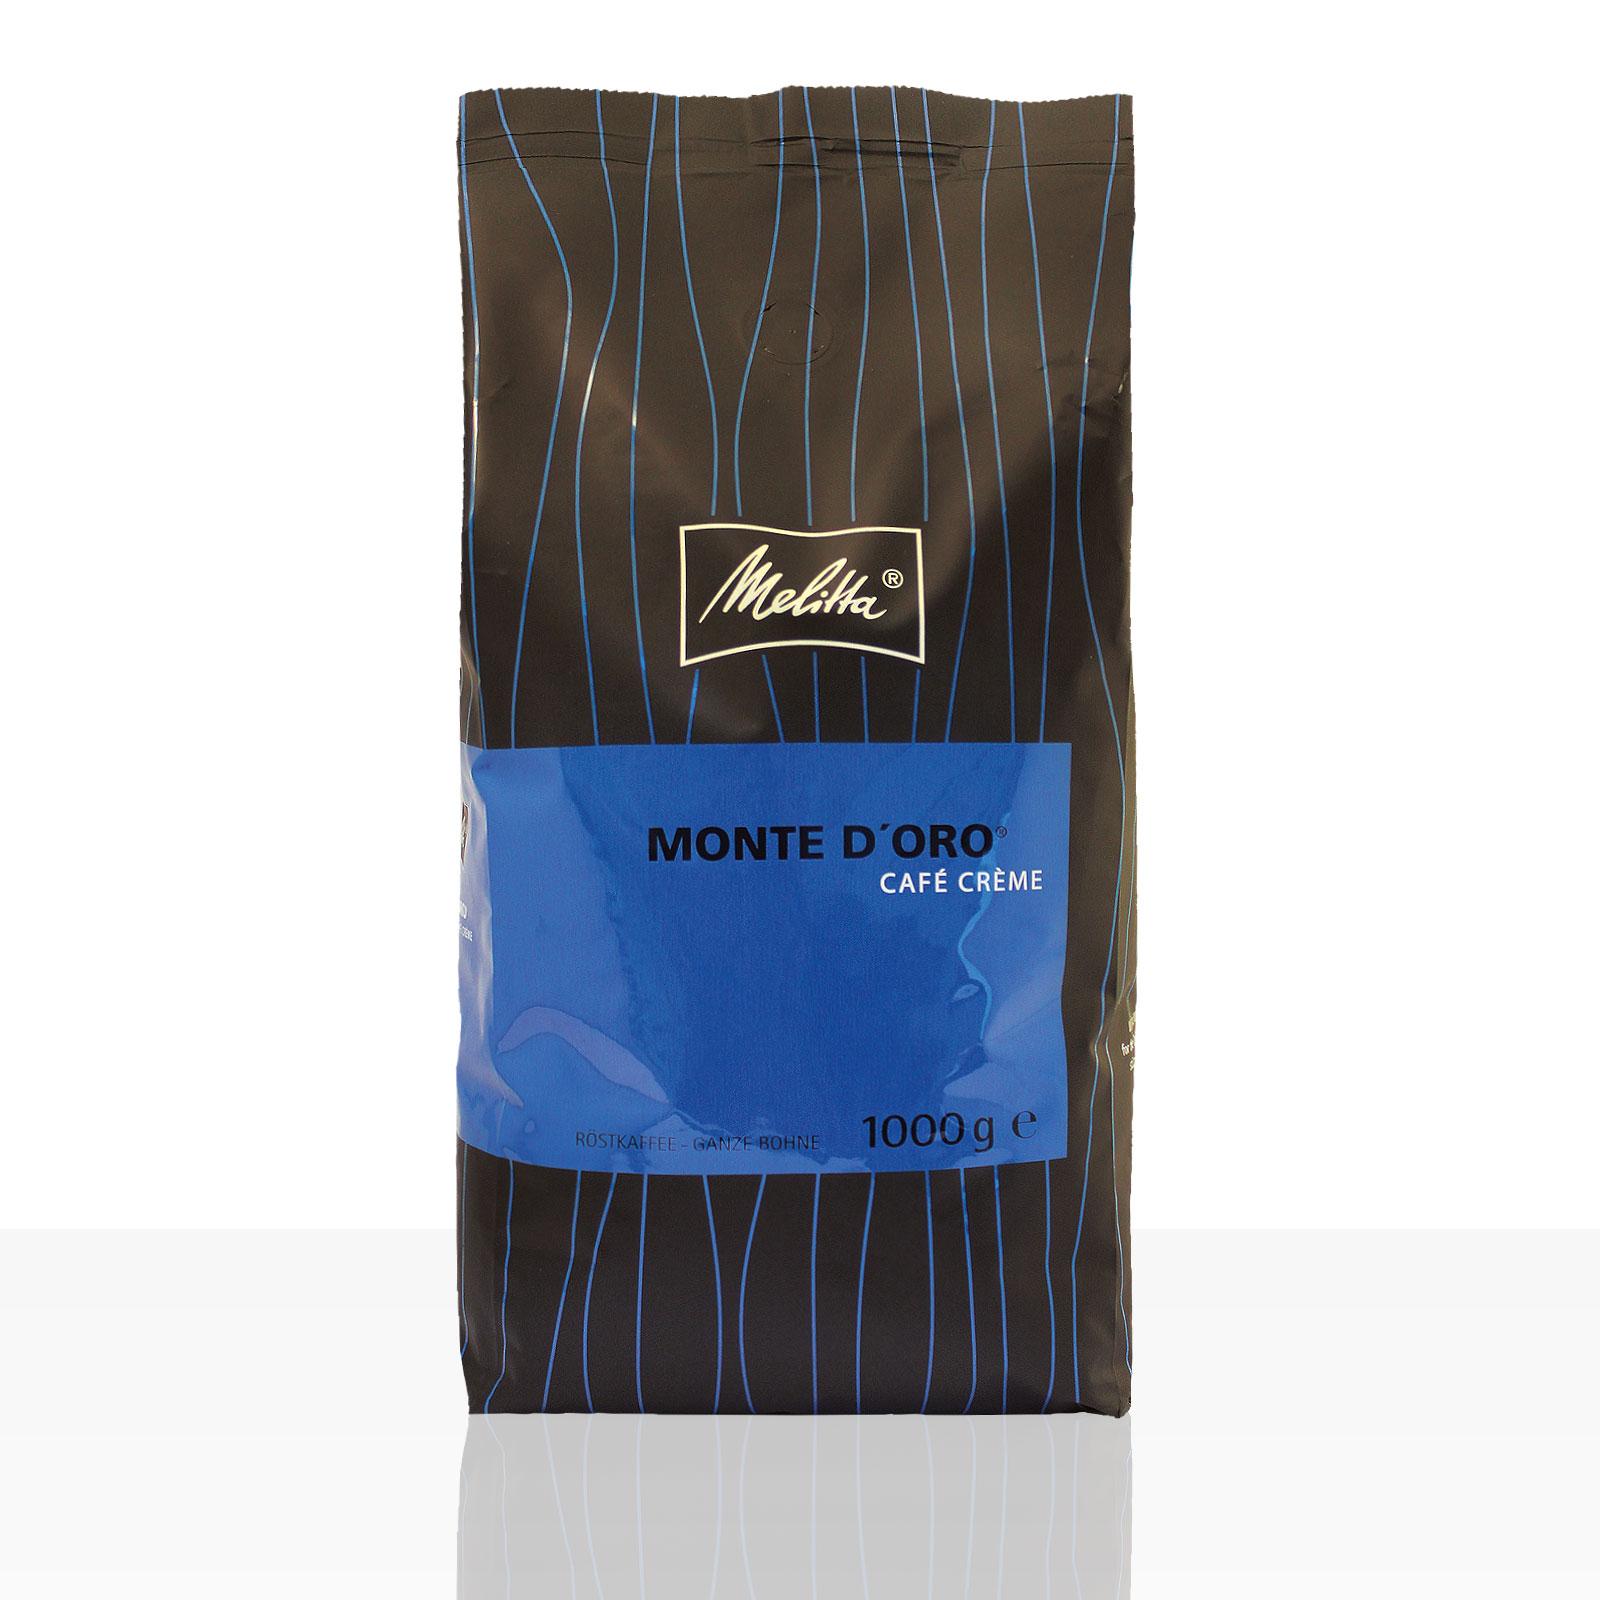 Melitta Monte D'Oro würzig Cafe Creme - 8 x 1kg ganze Kaffee-Bohne